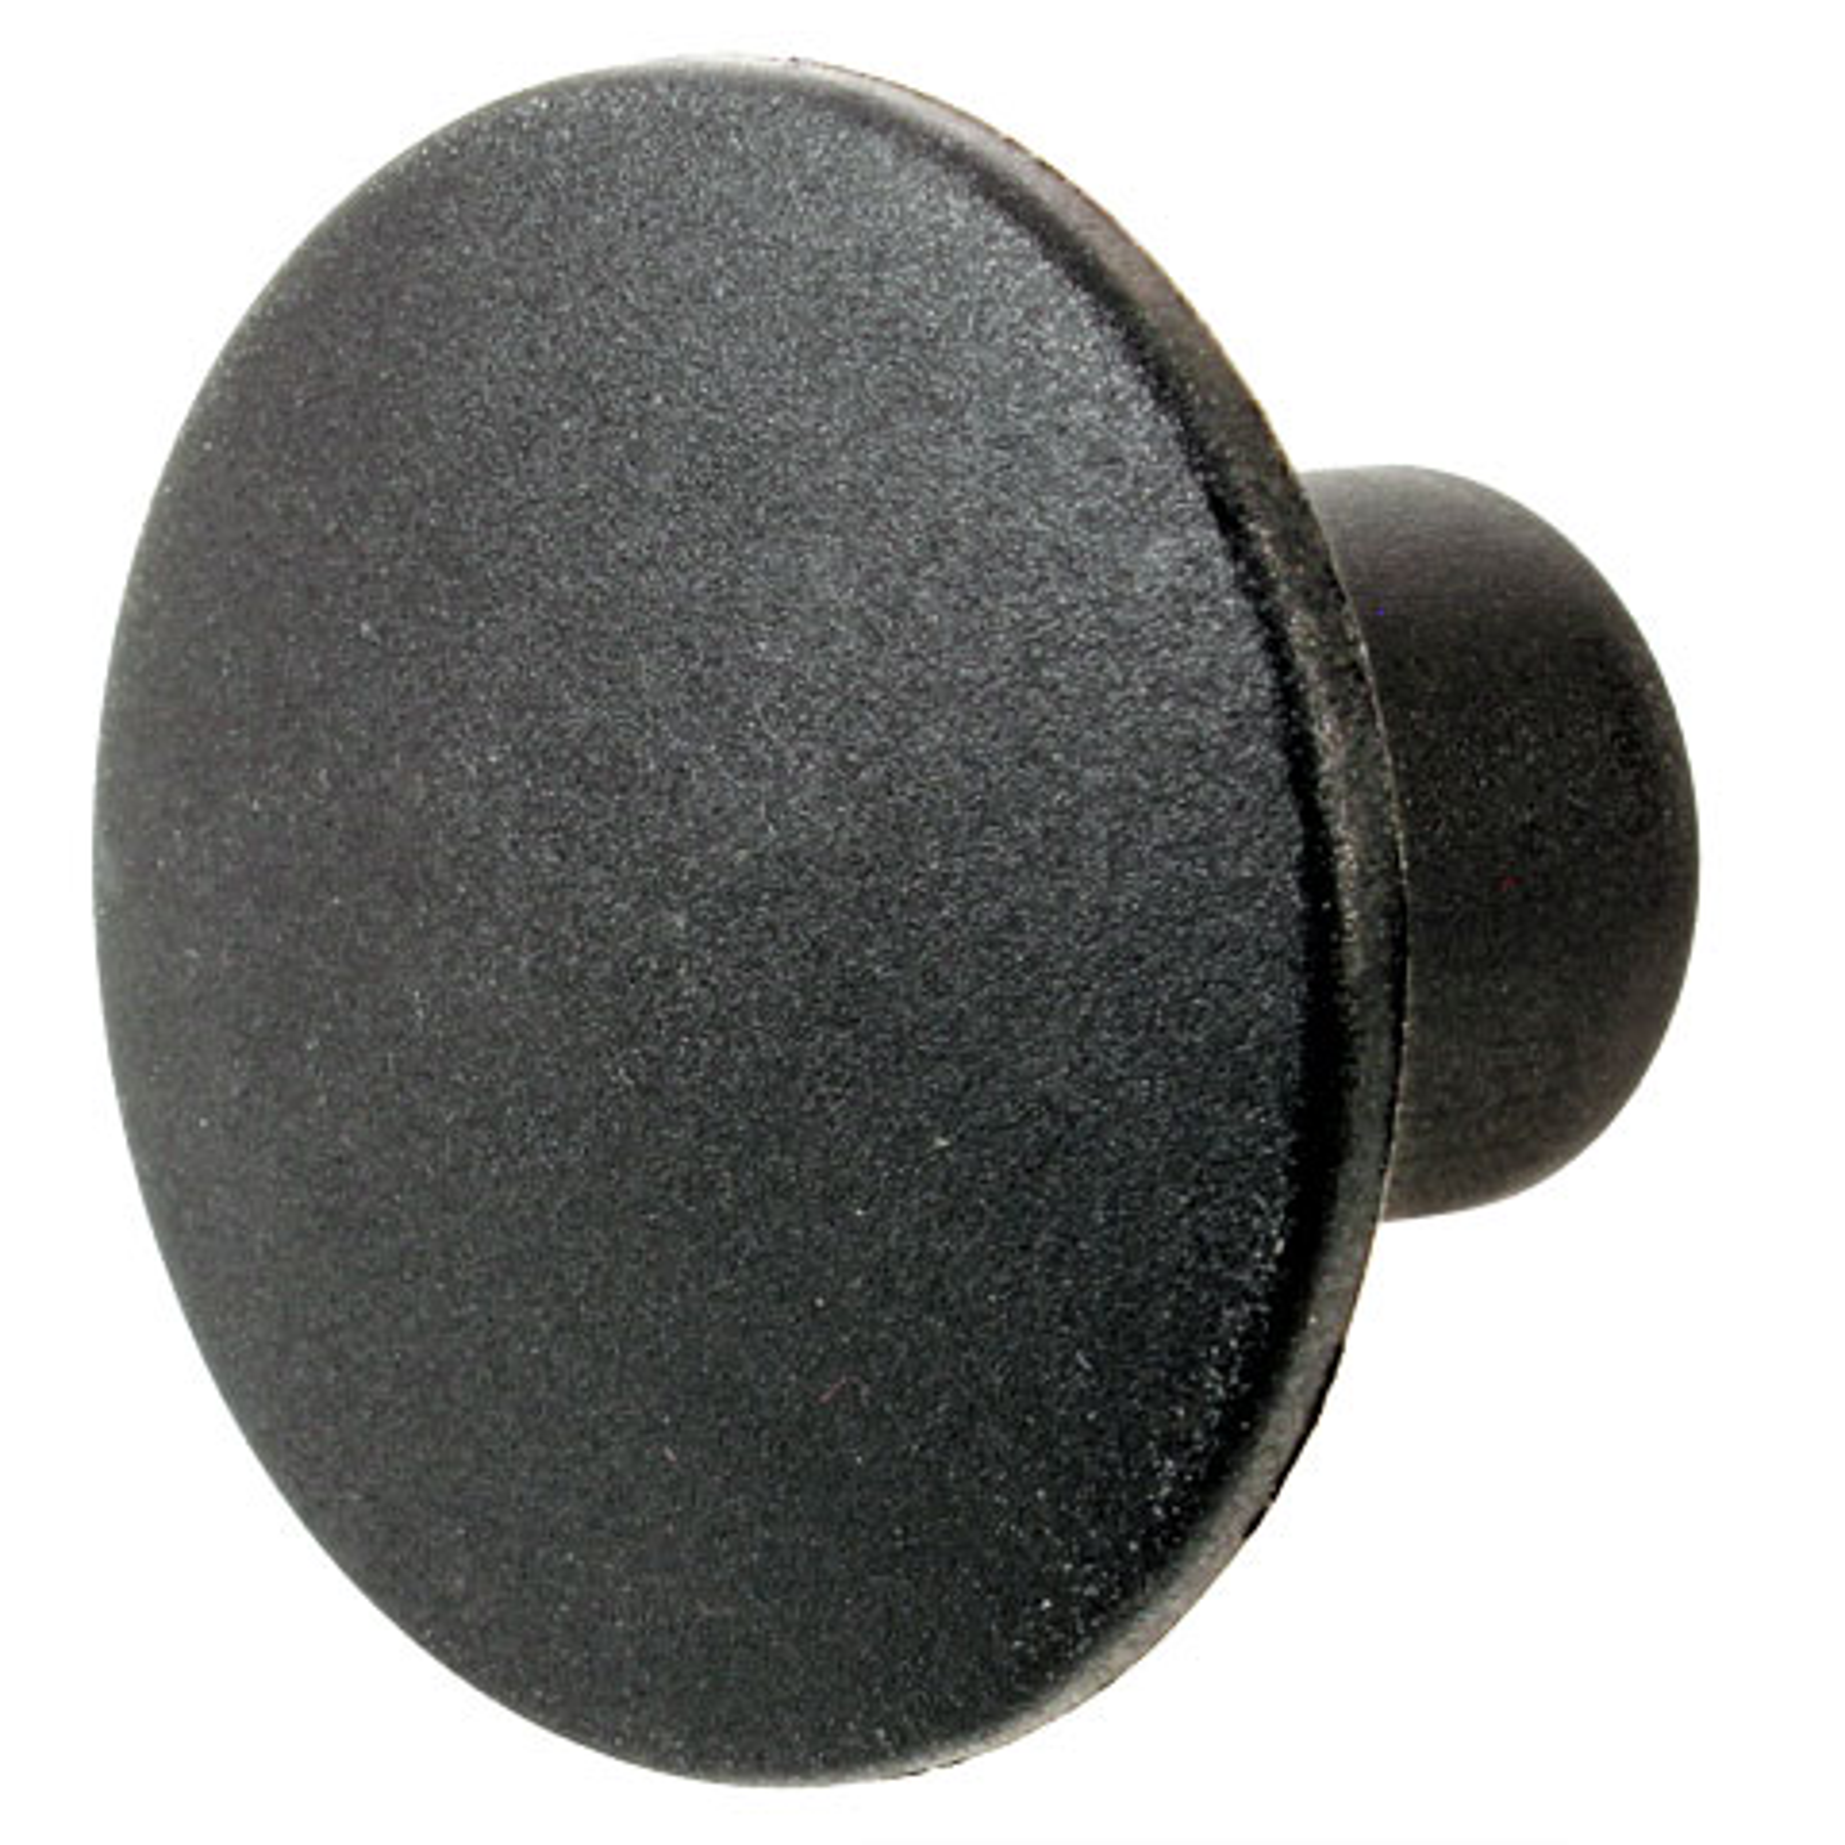 Knob for gripping - Mushroom - Technopolymer -